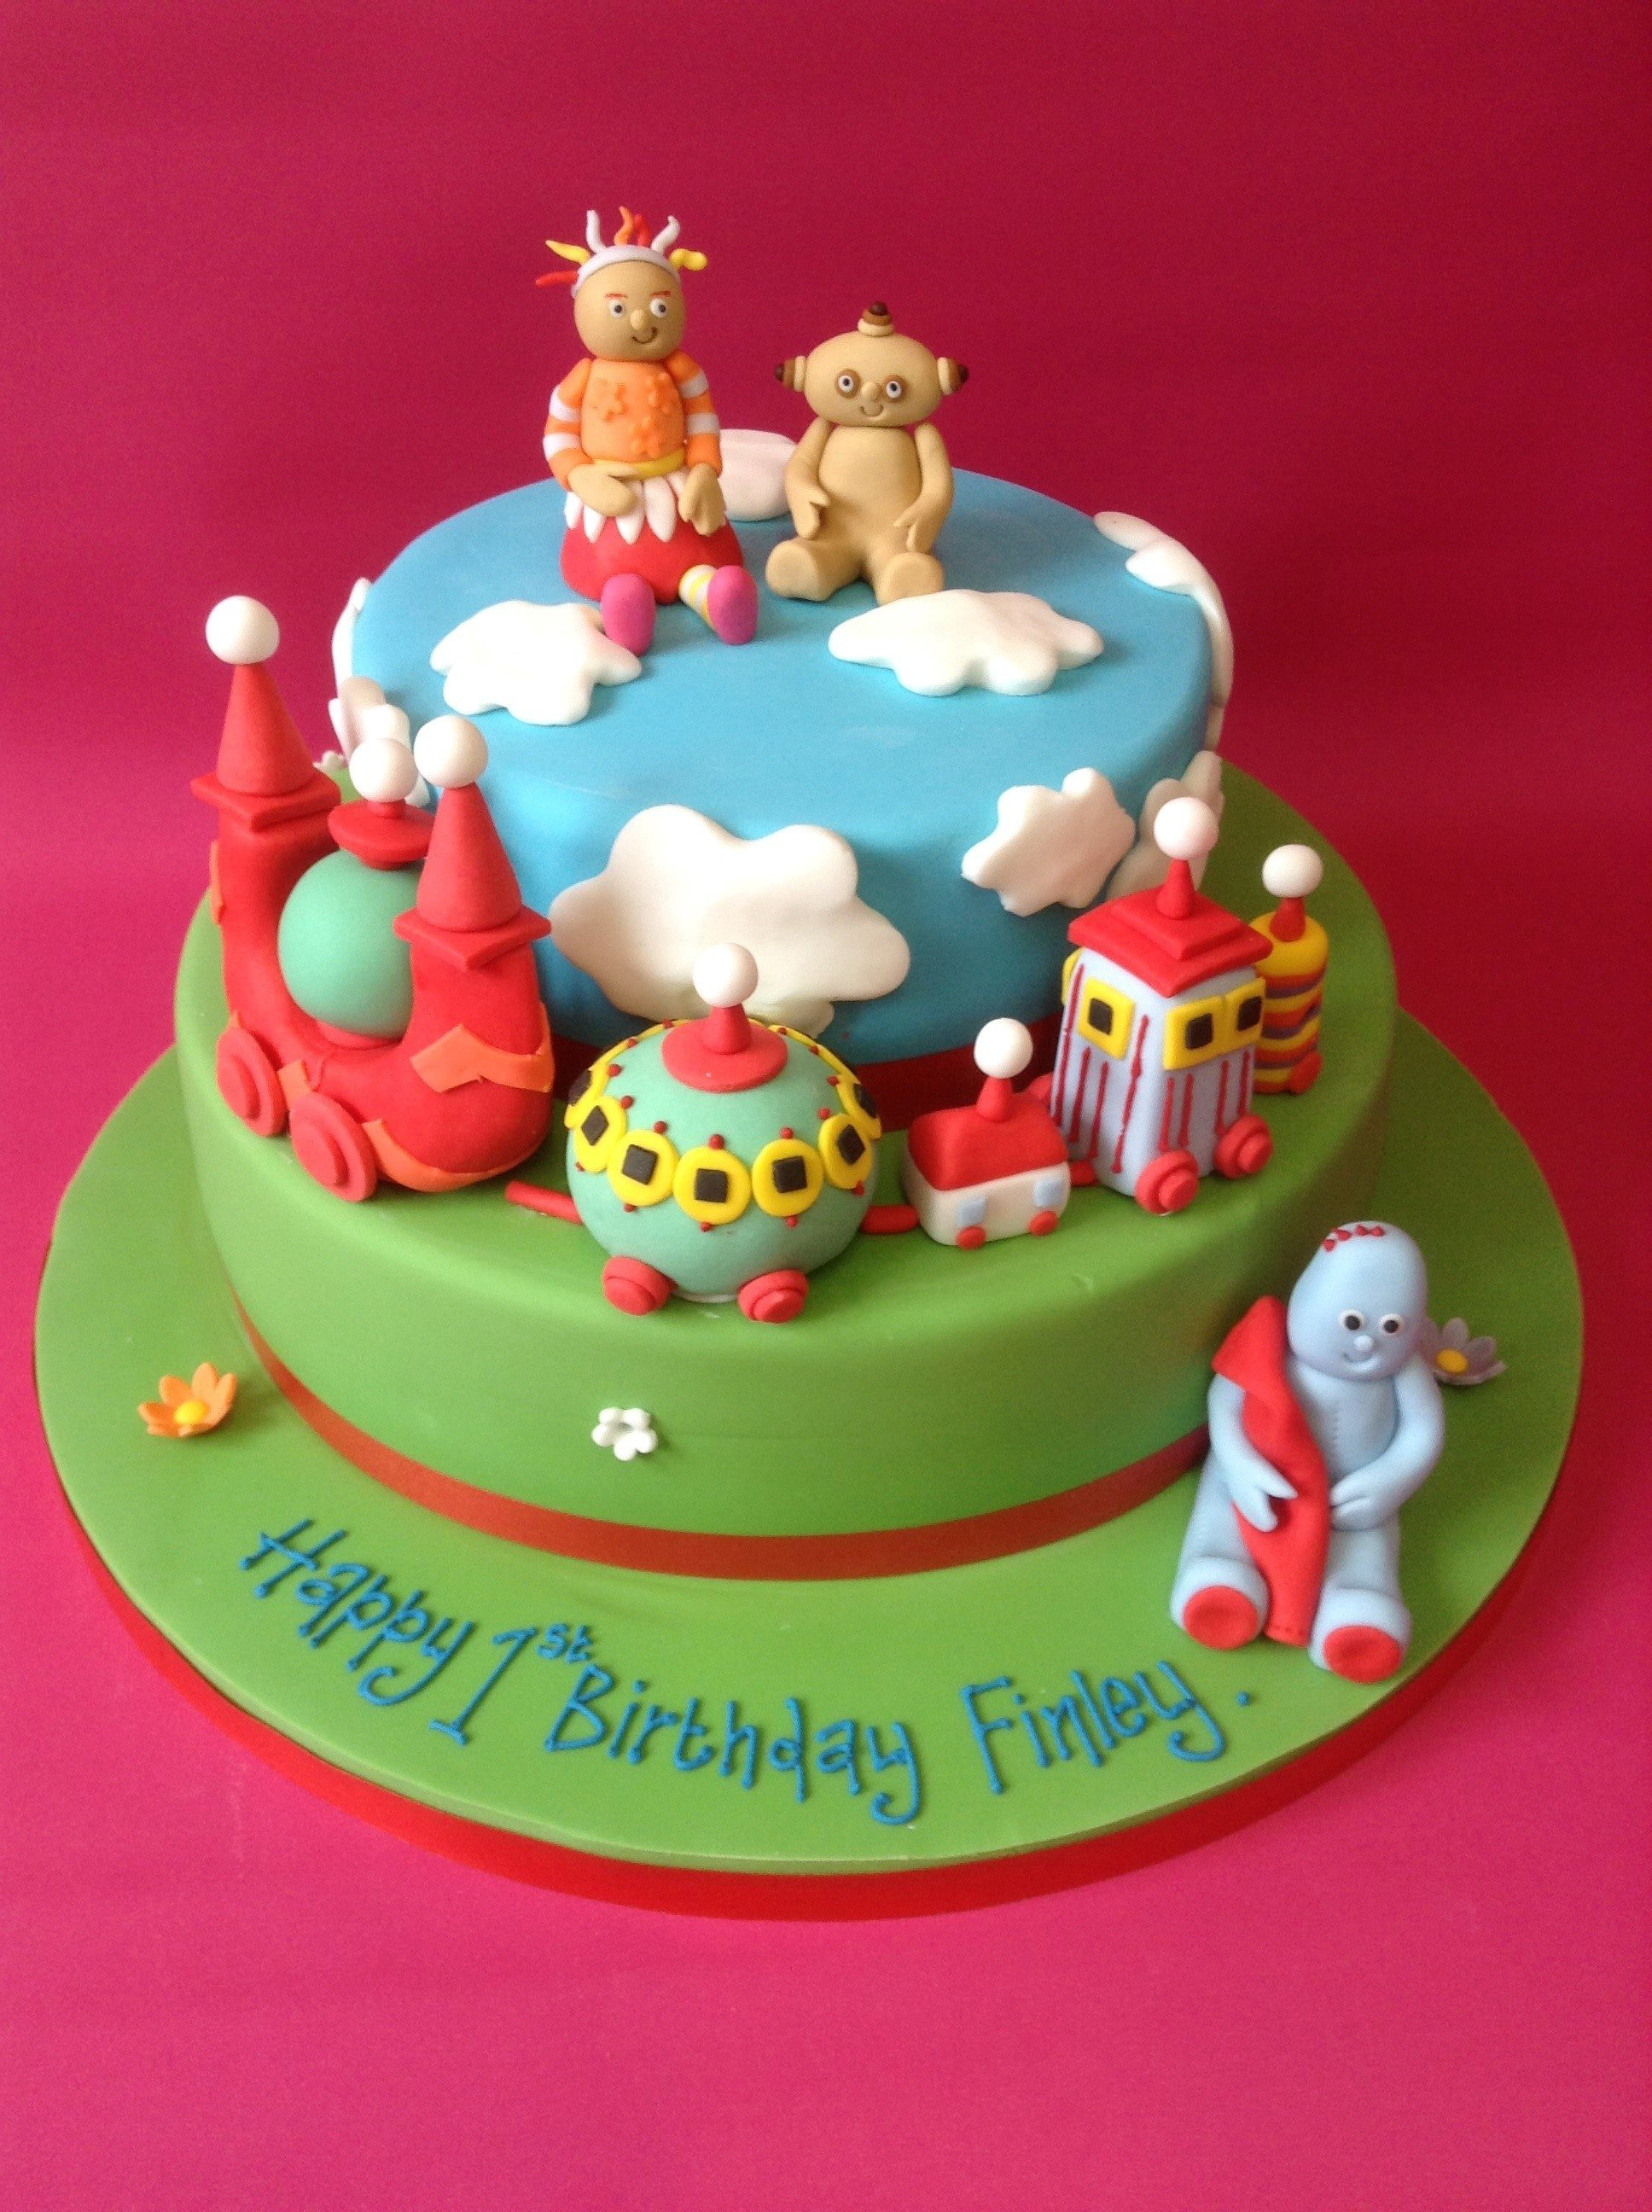 https://0201.nccdn.net/1_2/000/000/188/690/kids-character-bday-cake-min.jpg